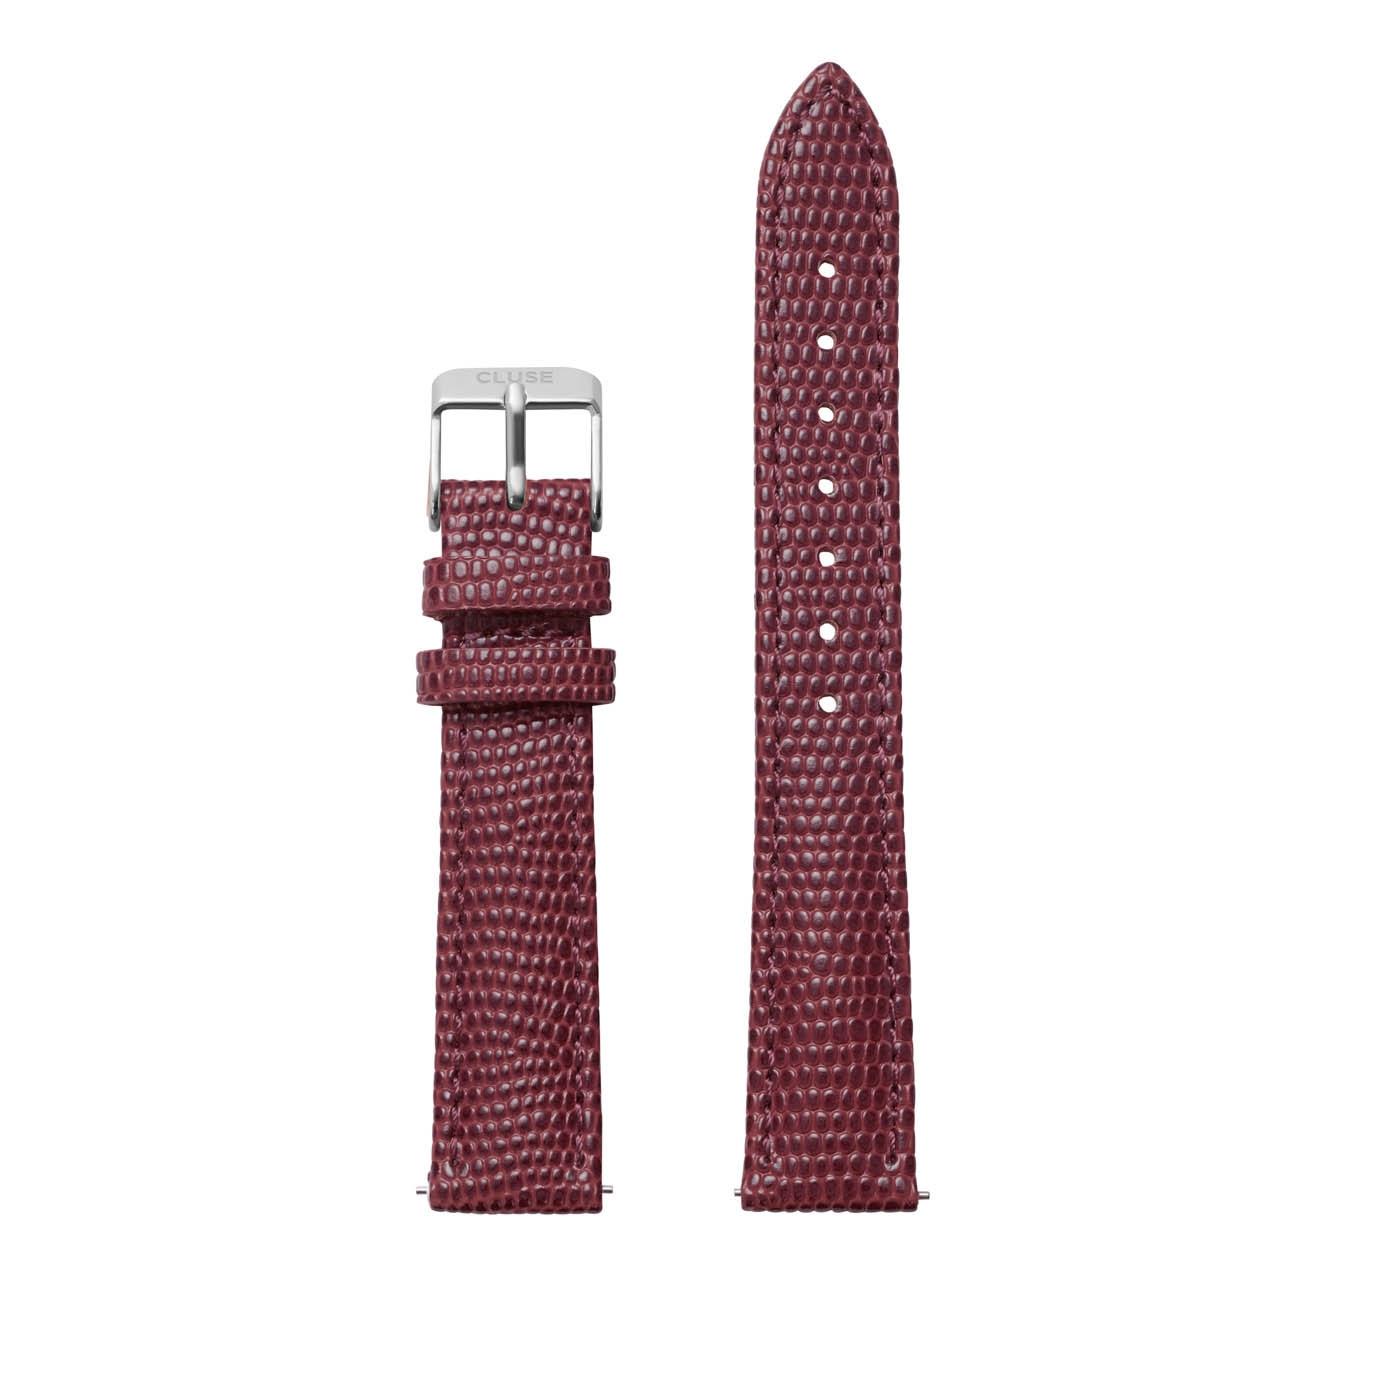 CLUSE Strap 16 mm Minuit Burgundy Lizard CLS378